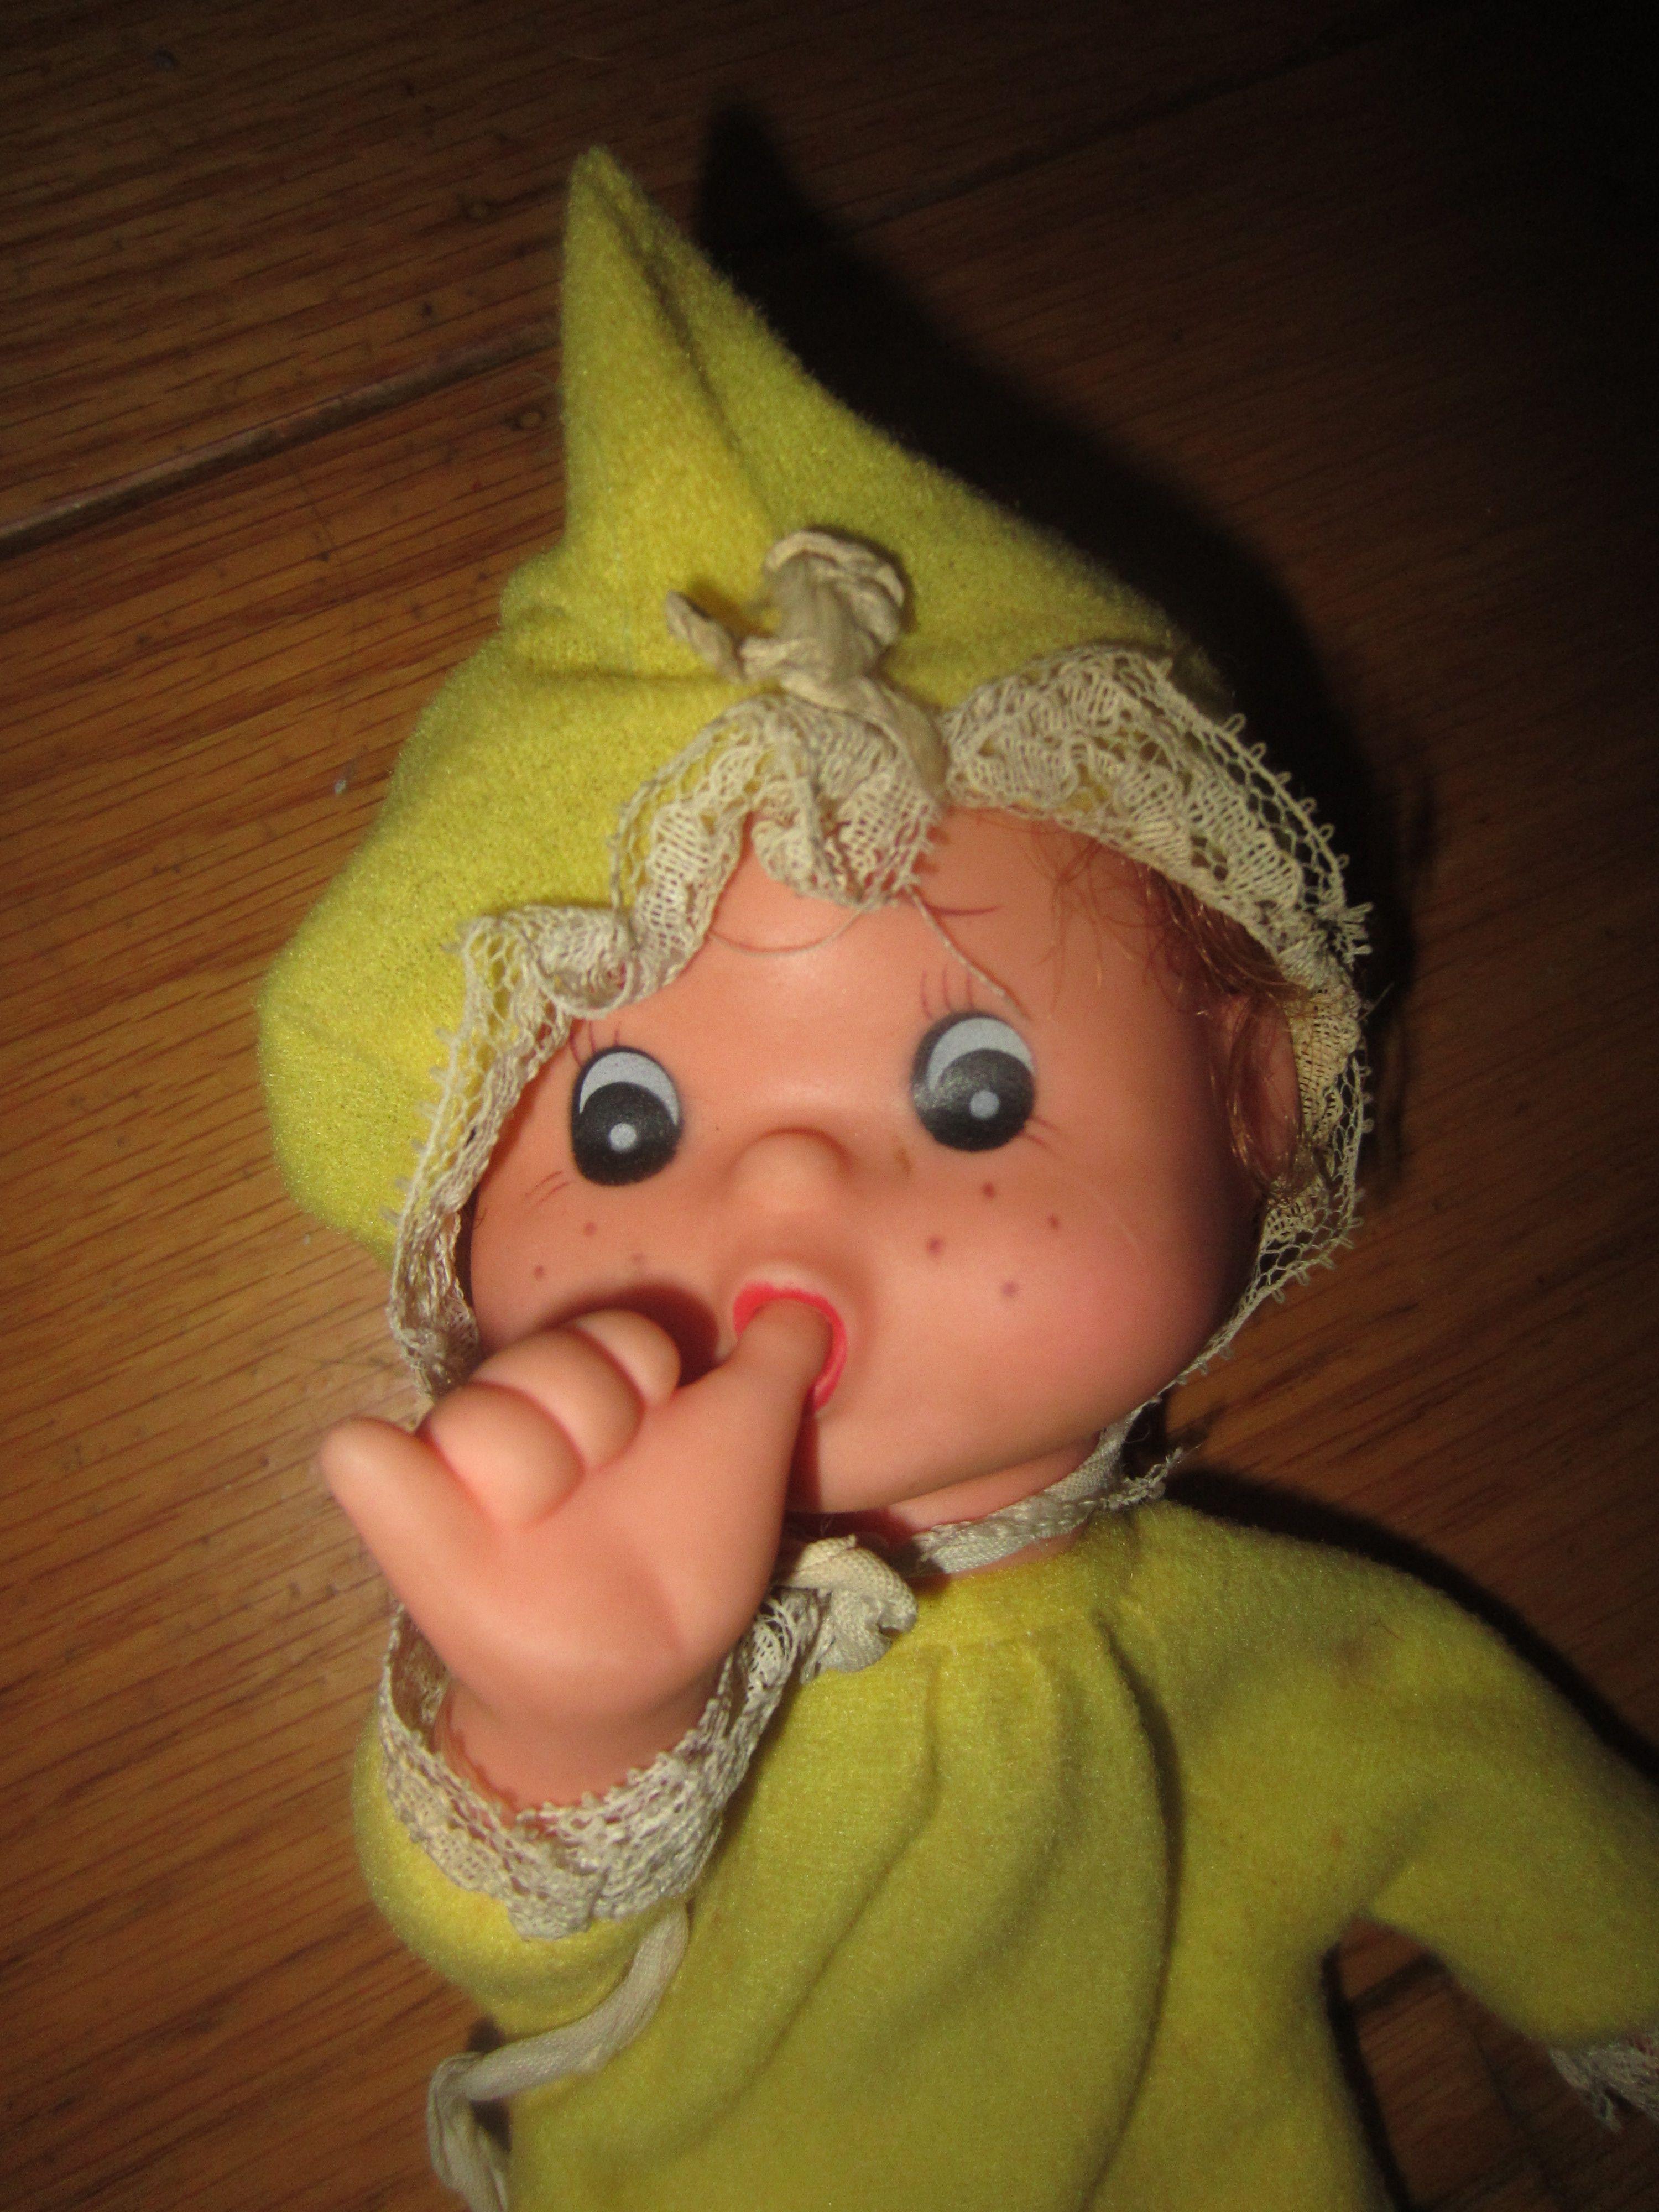 Vintage Baby Beans Thumb-sucking Doll Hong Kong Kitschy Toy   My ...